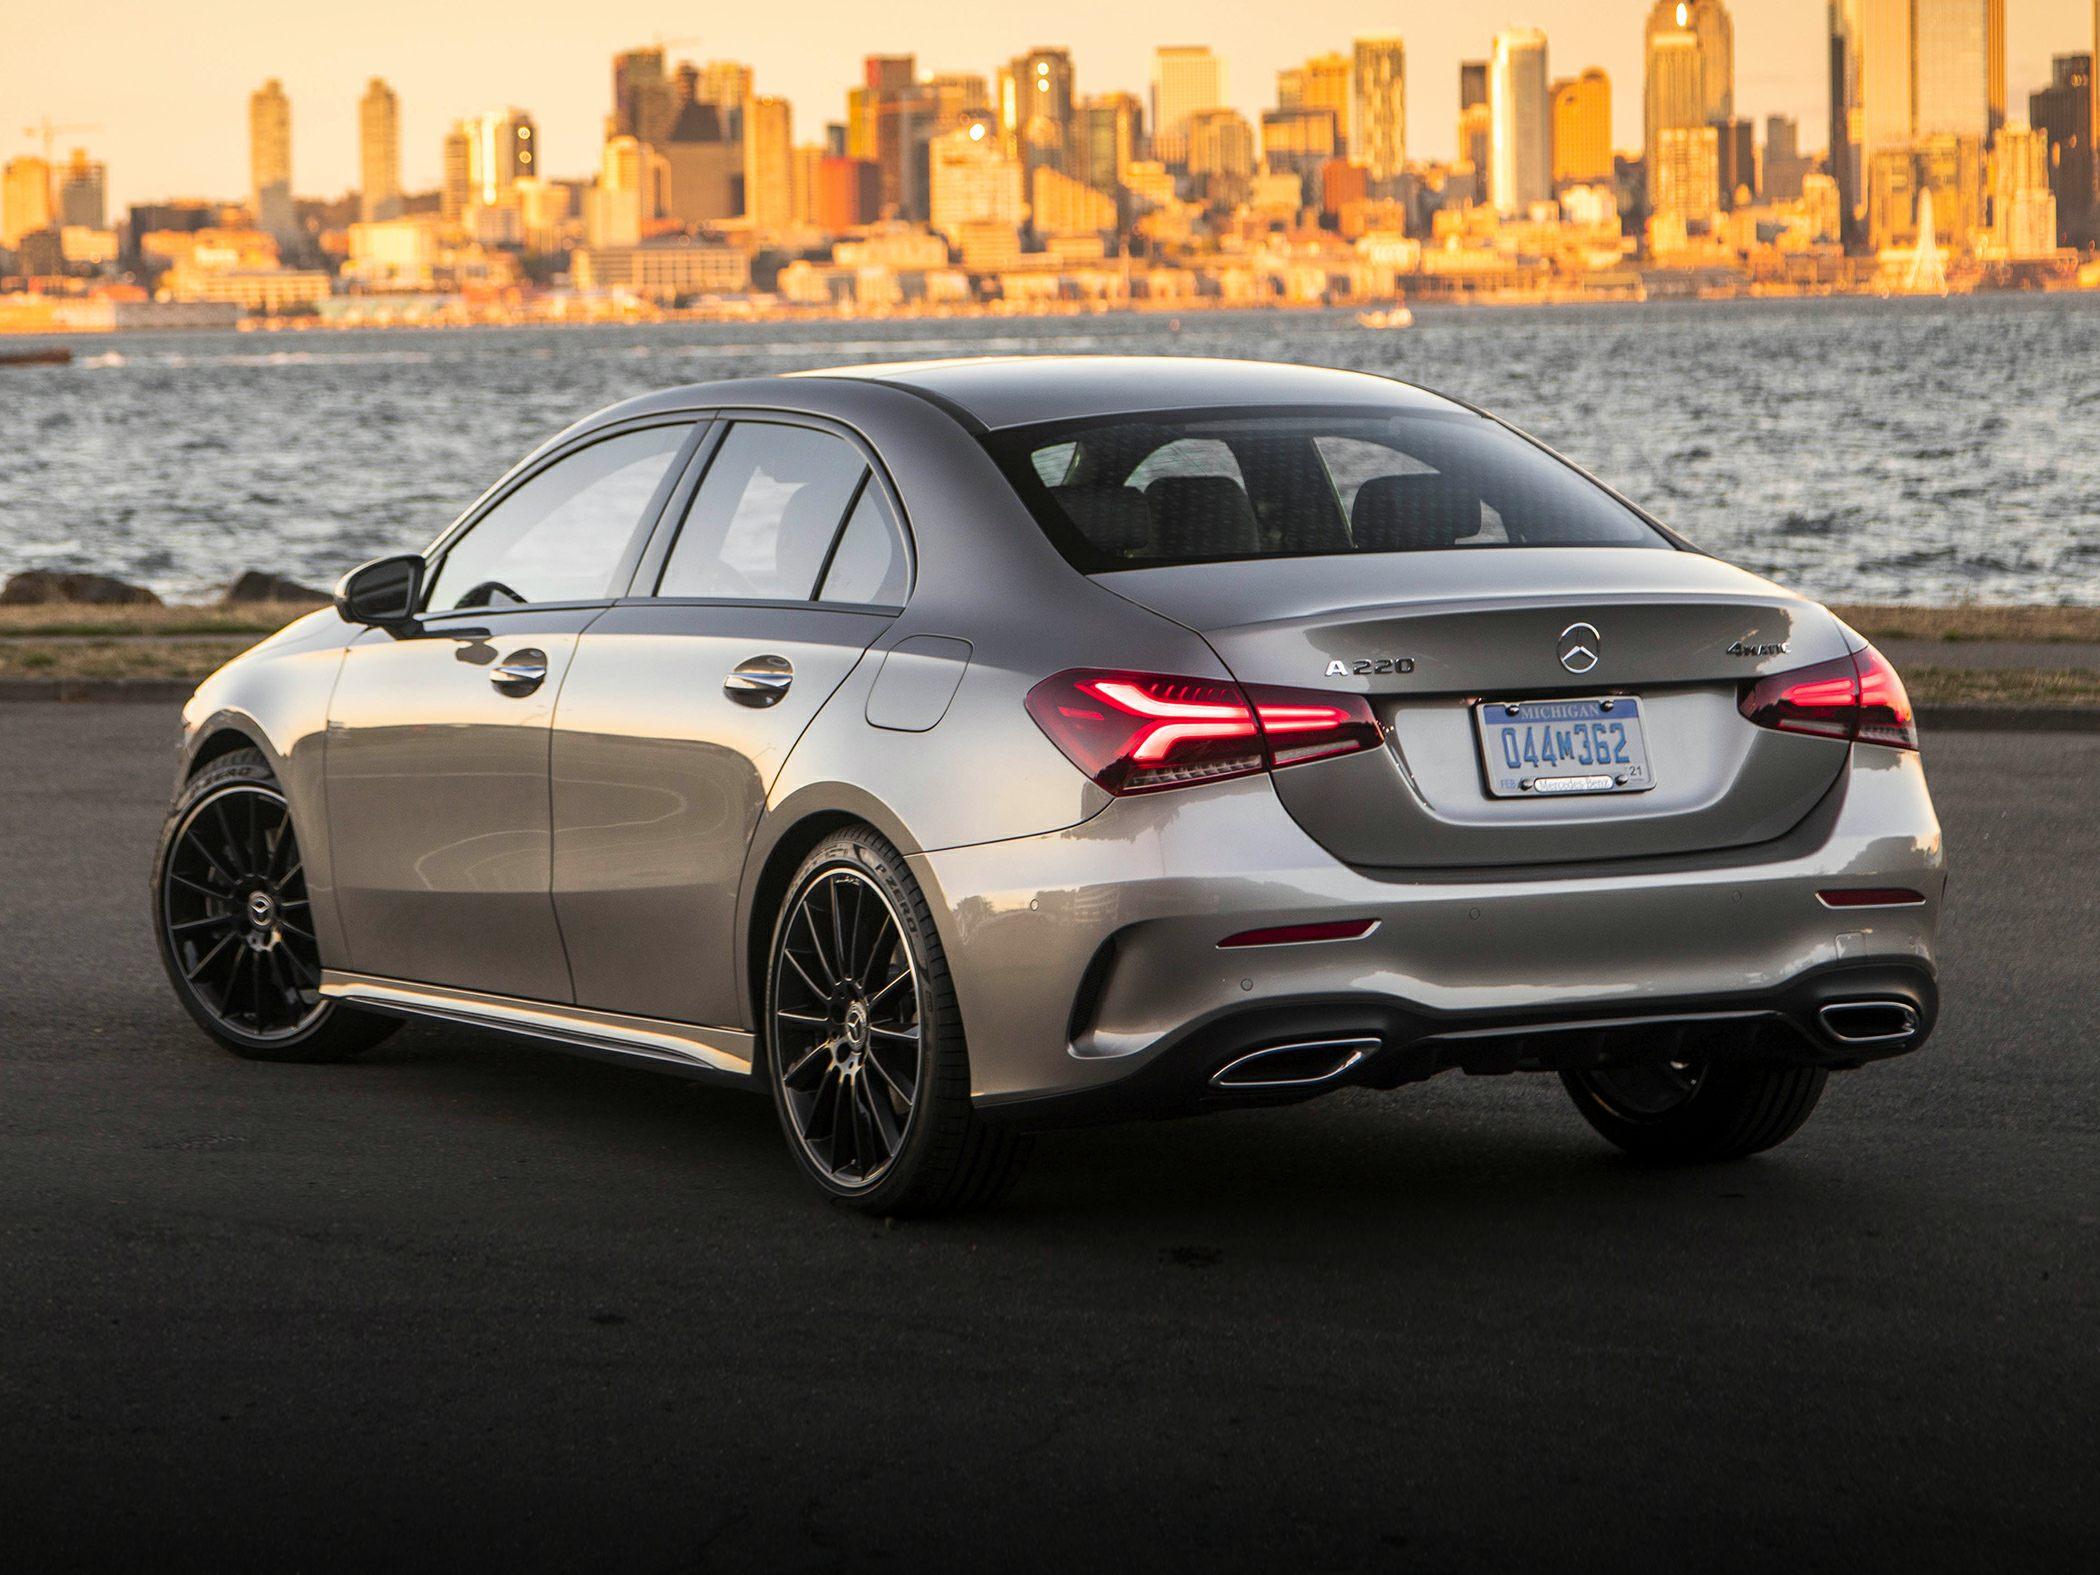 2021 Mercedes-Benz A-Class Deals, Prices, Incentives ...